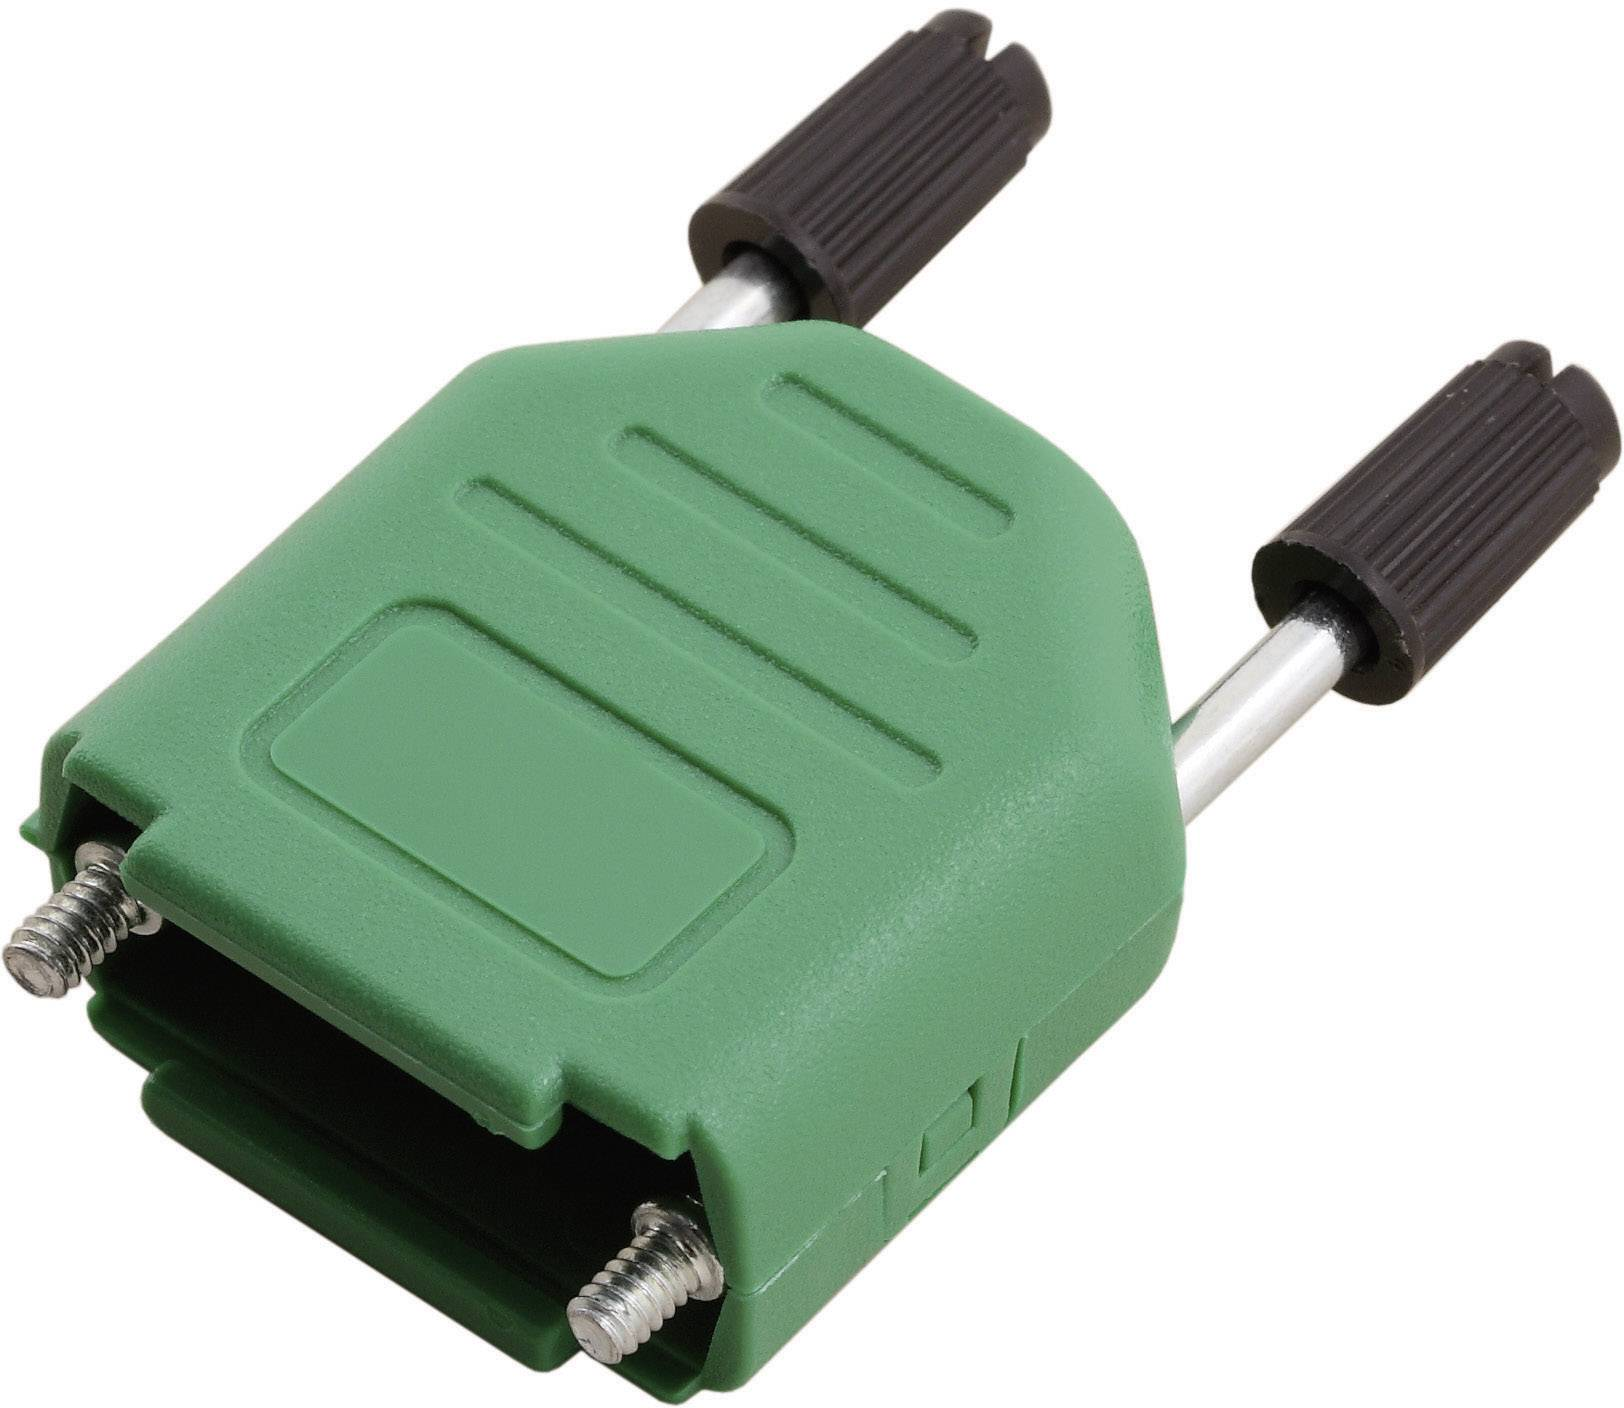 D-SUB púzdro MH Connectors MHDPPK25-G-K 6353-0106-03, Počet pinov: 25, plast, 180 °, zelená, 1 ks